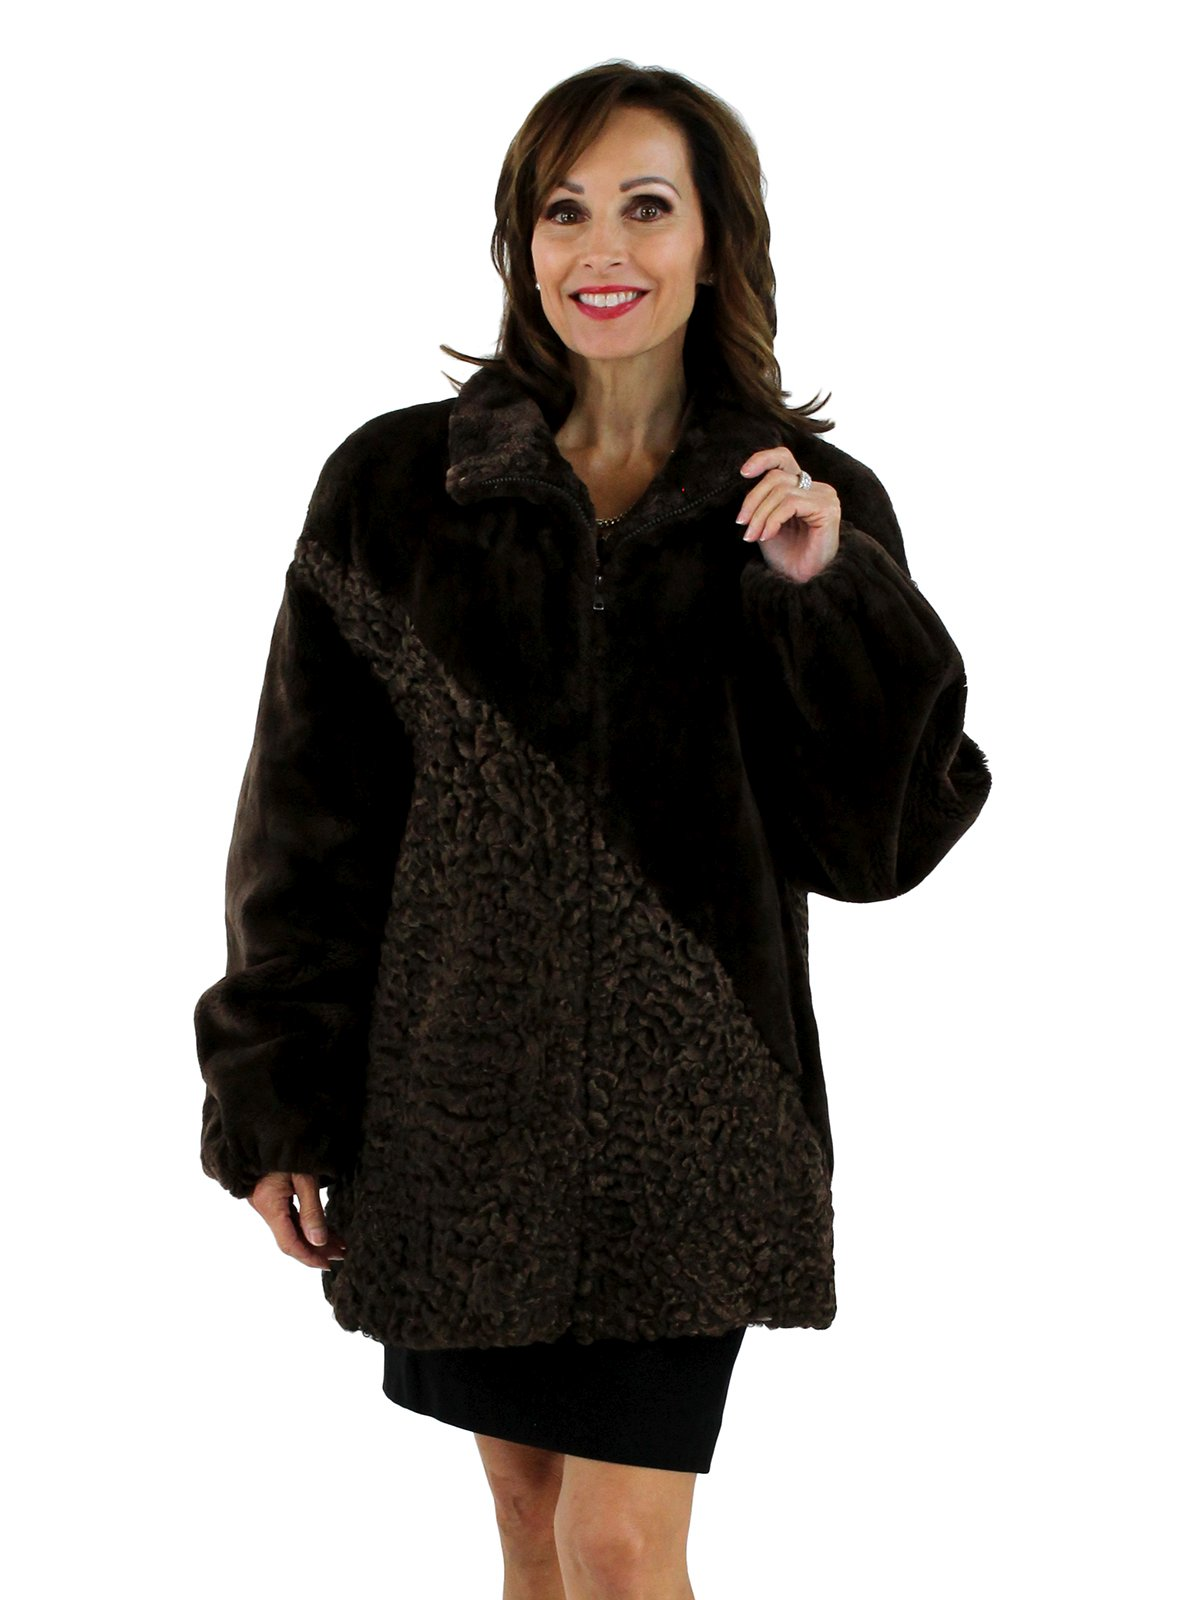 009d1a33b39c81 Sheared Beaver Fur Jacket with Persian Lamb - Women s XLarge - Brown ...